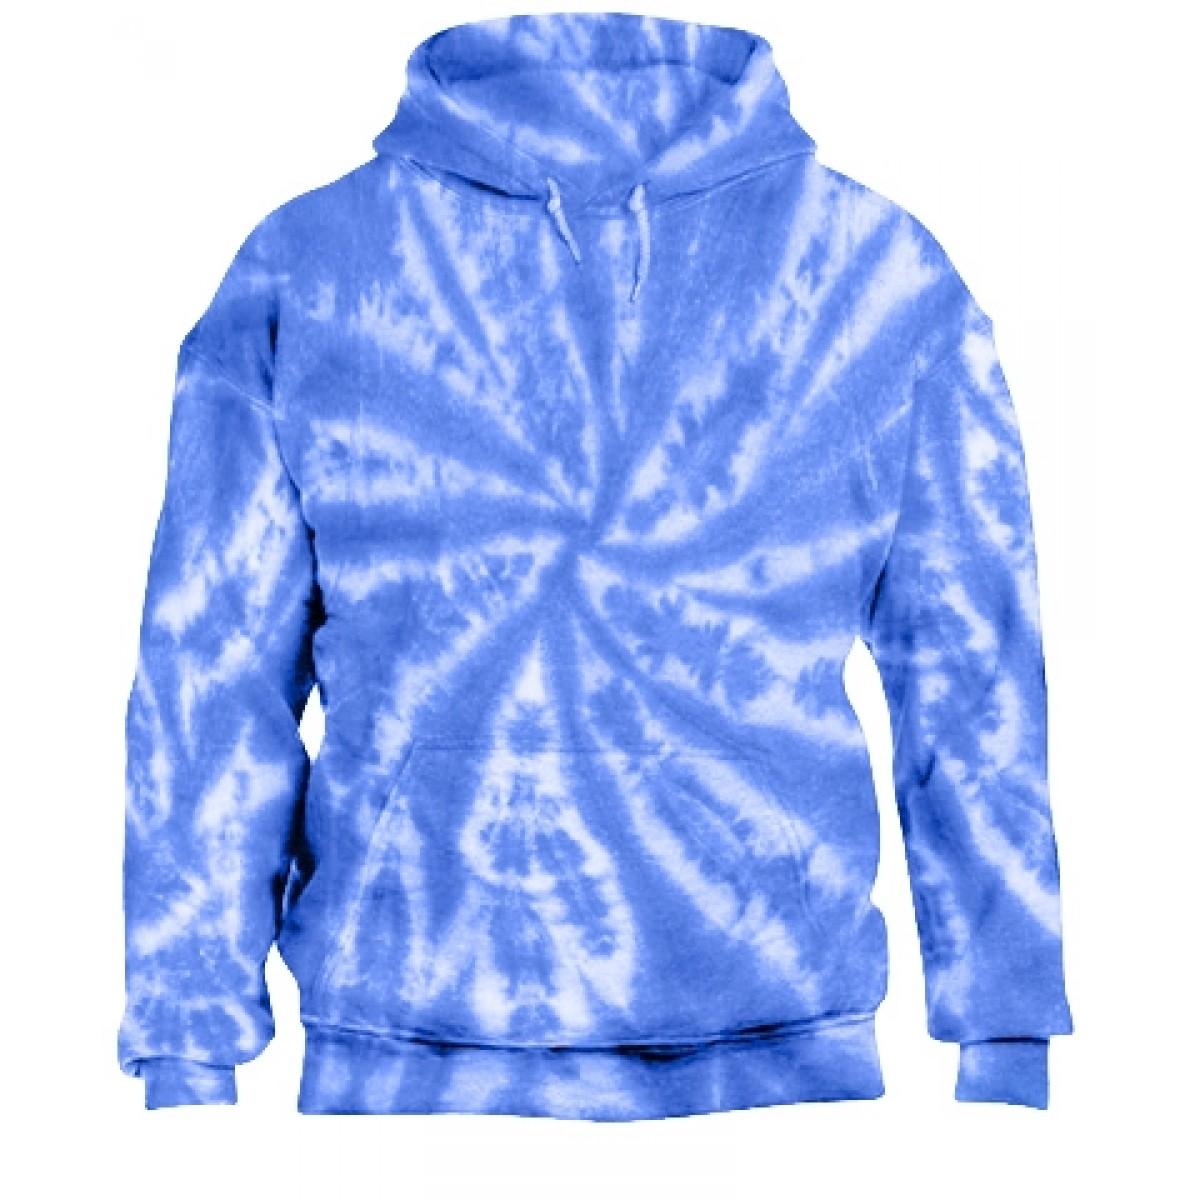 Tie-Dye Pullover Hooded Sweatshirt-Blue-YL